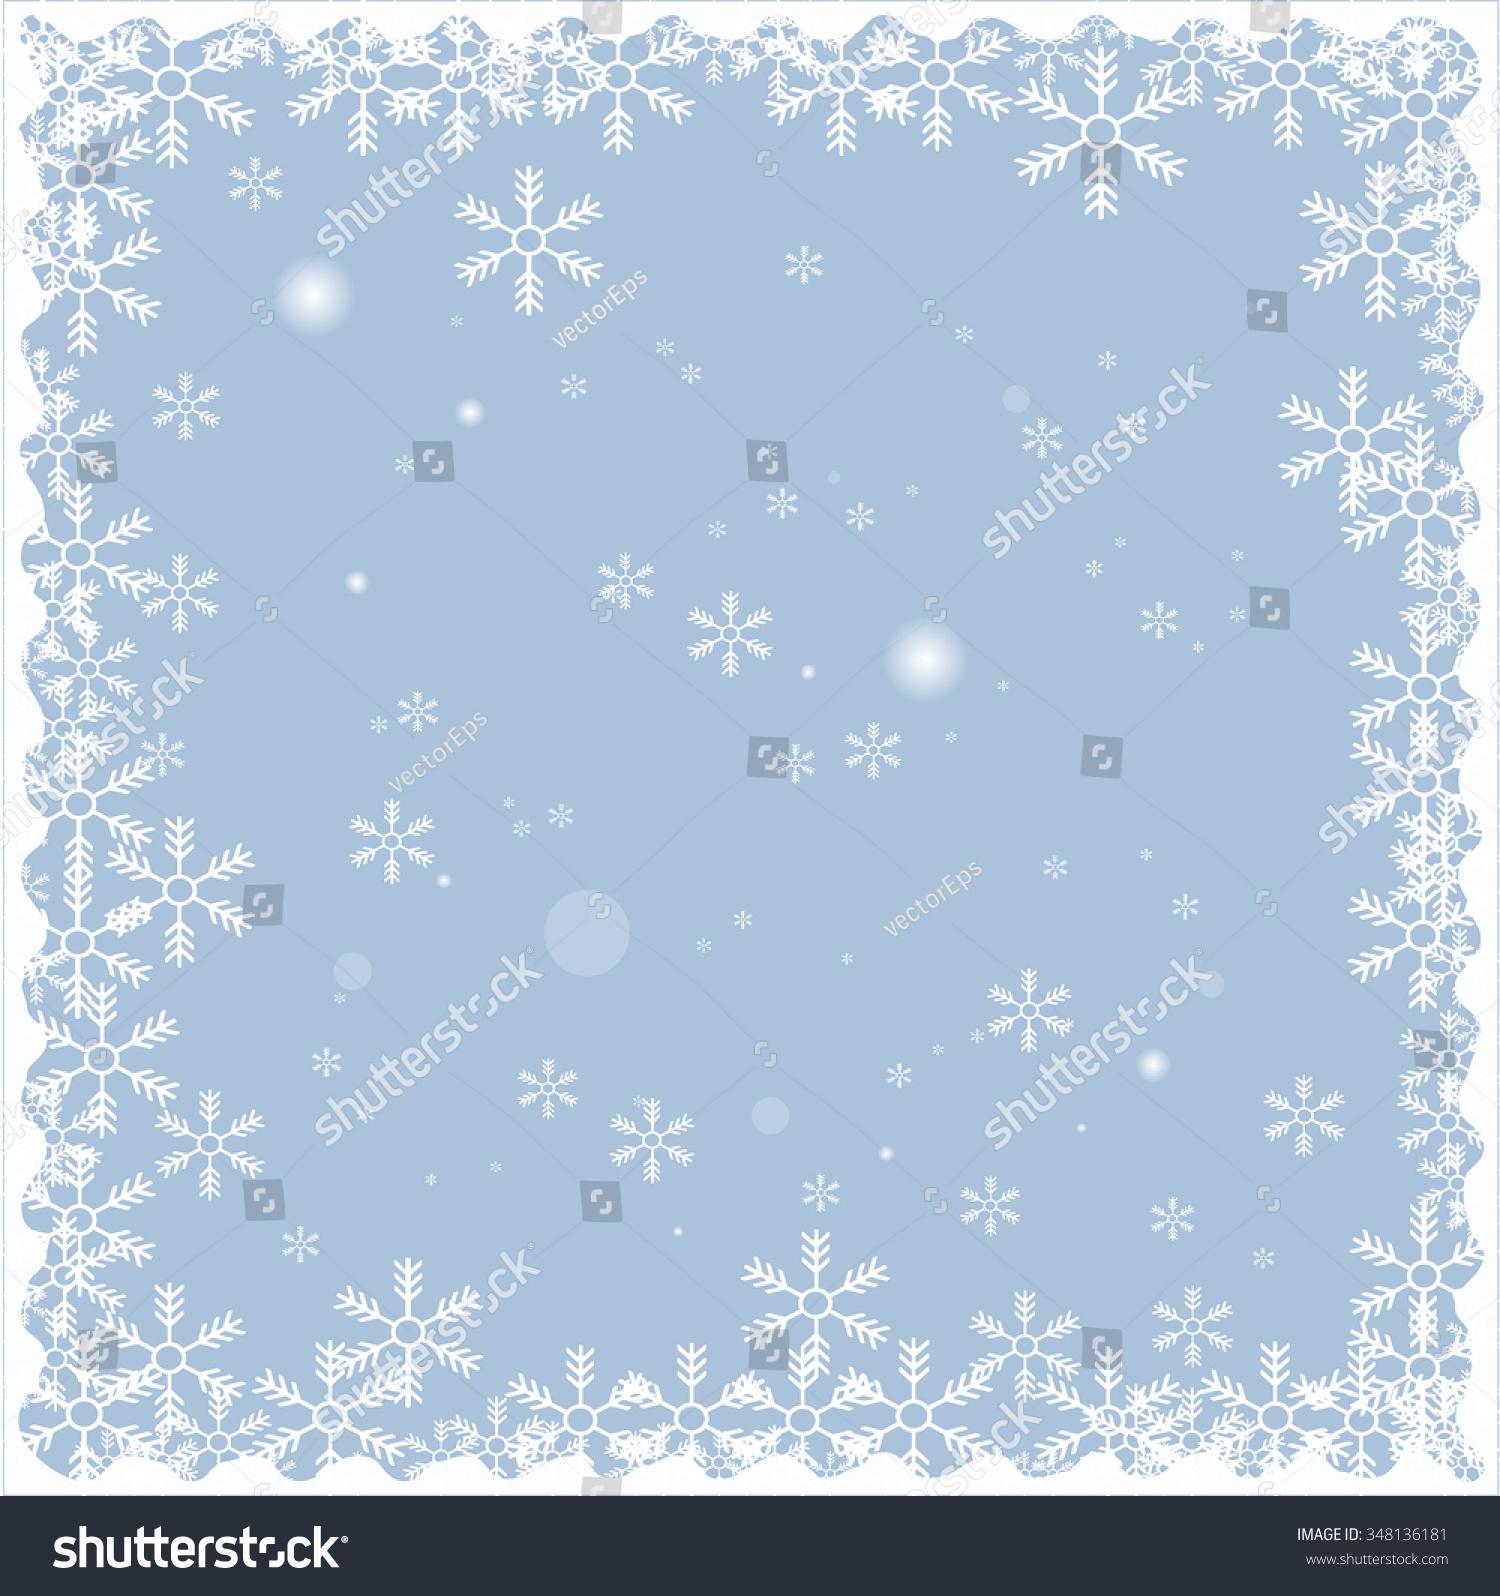 Extraordinary snowflake vectors photographs